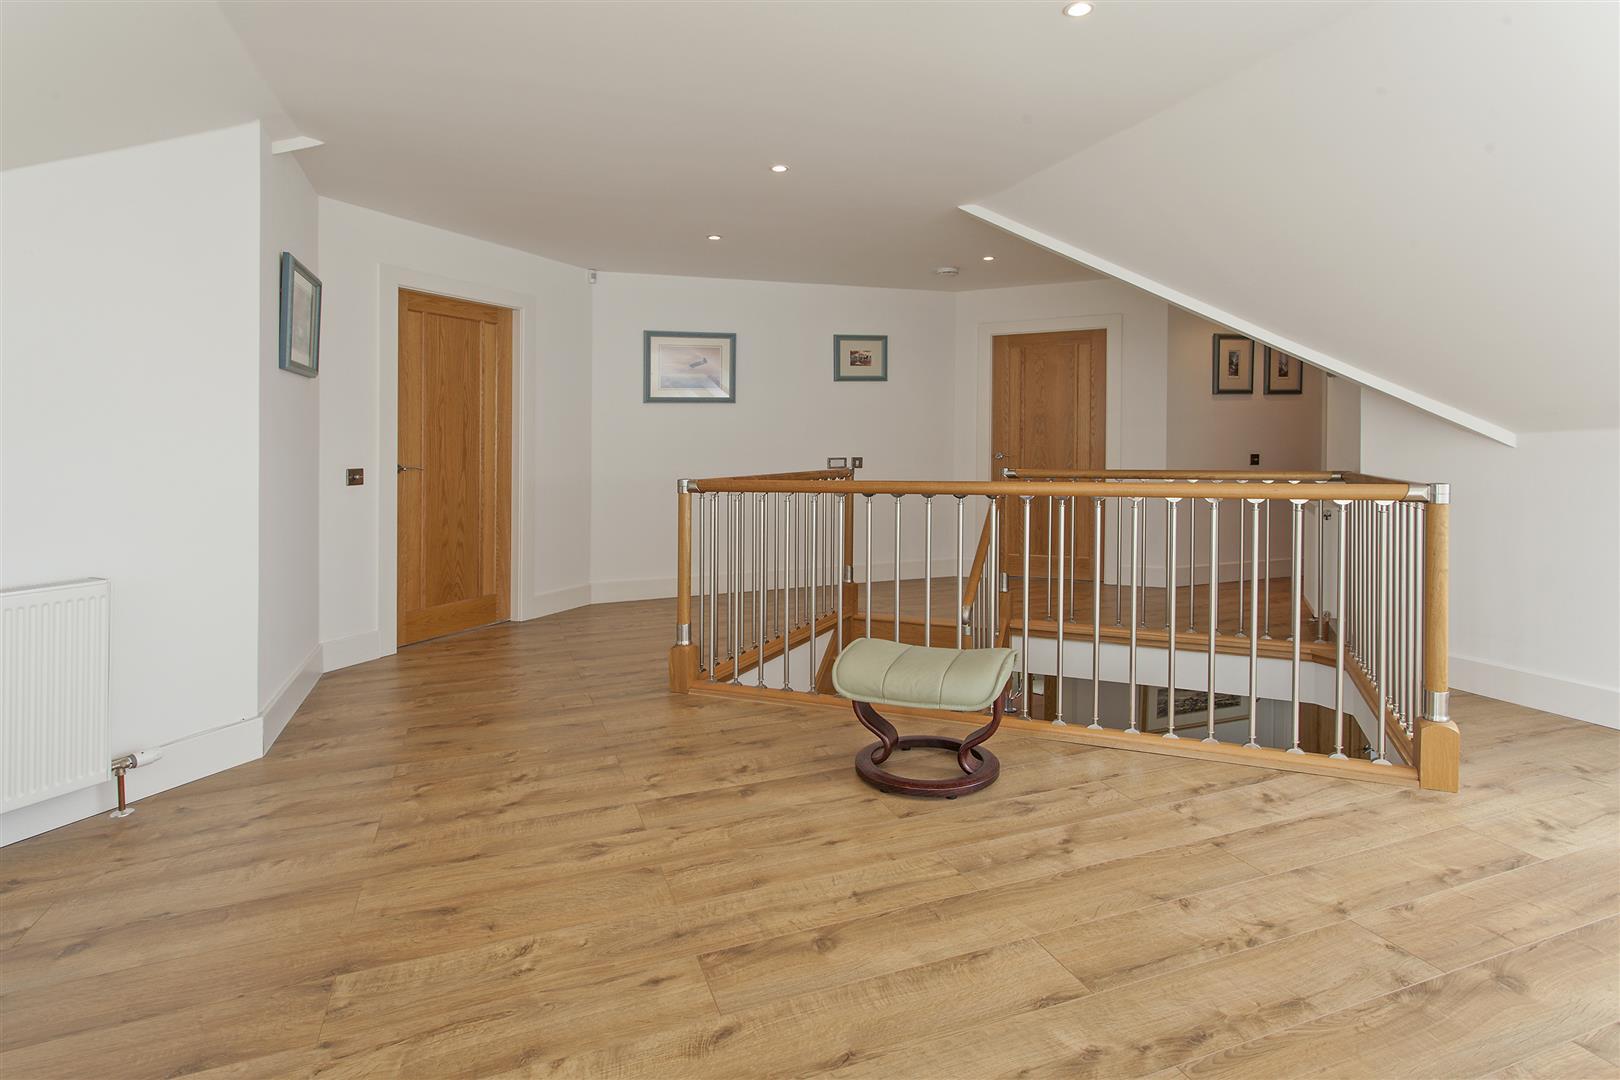 Sanibel, Broadfold Farm, Auchterarder, Perthshire, PH3 1DR, UK